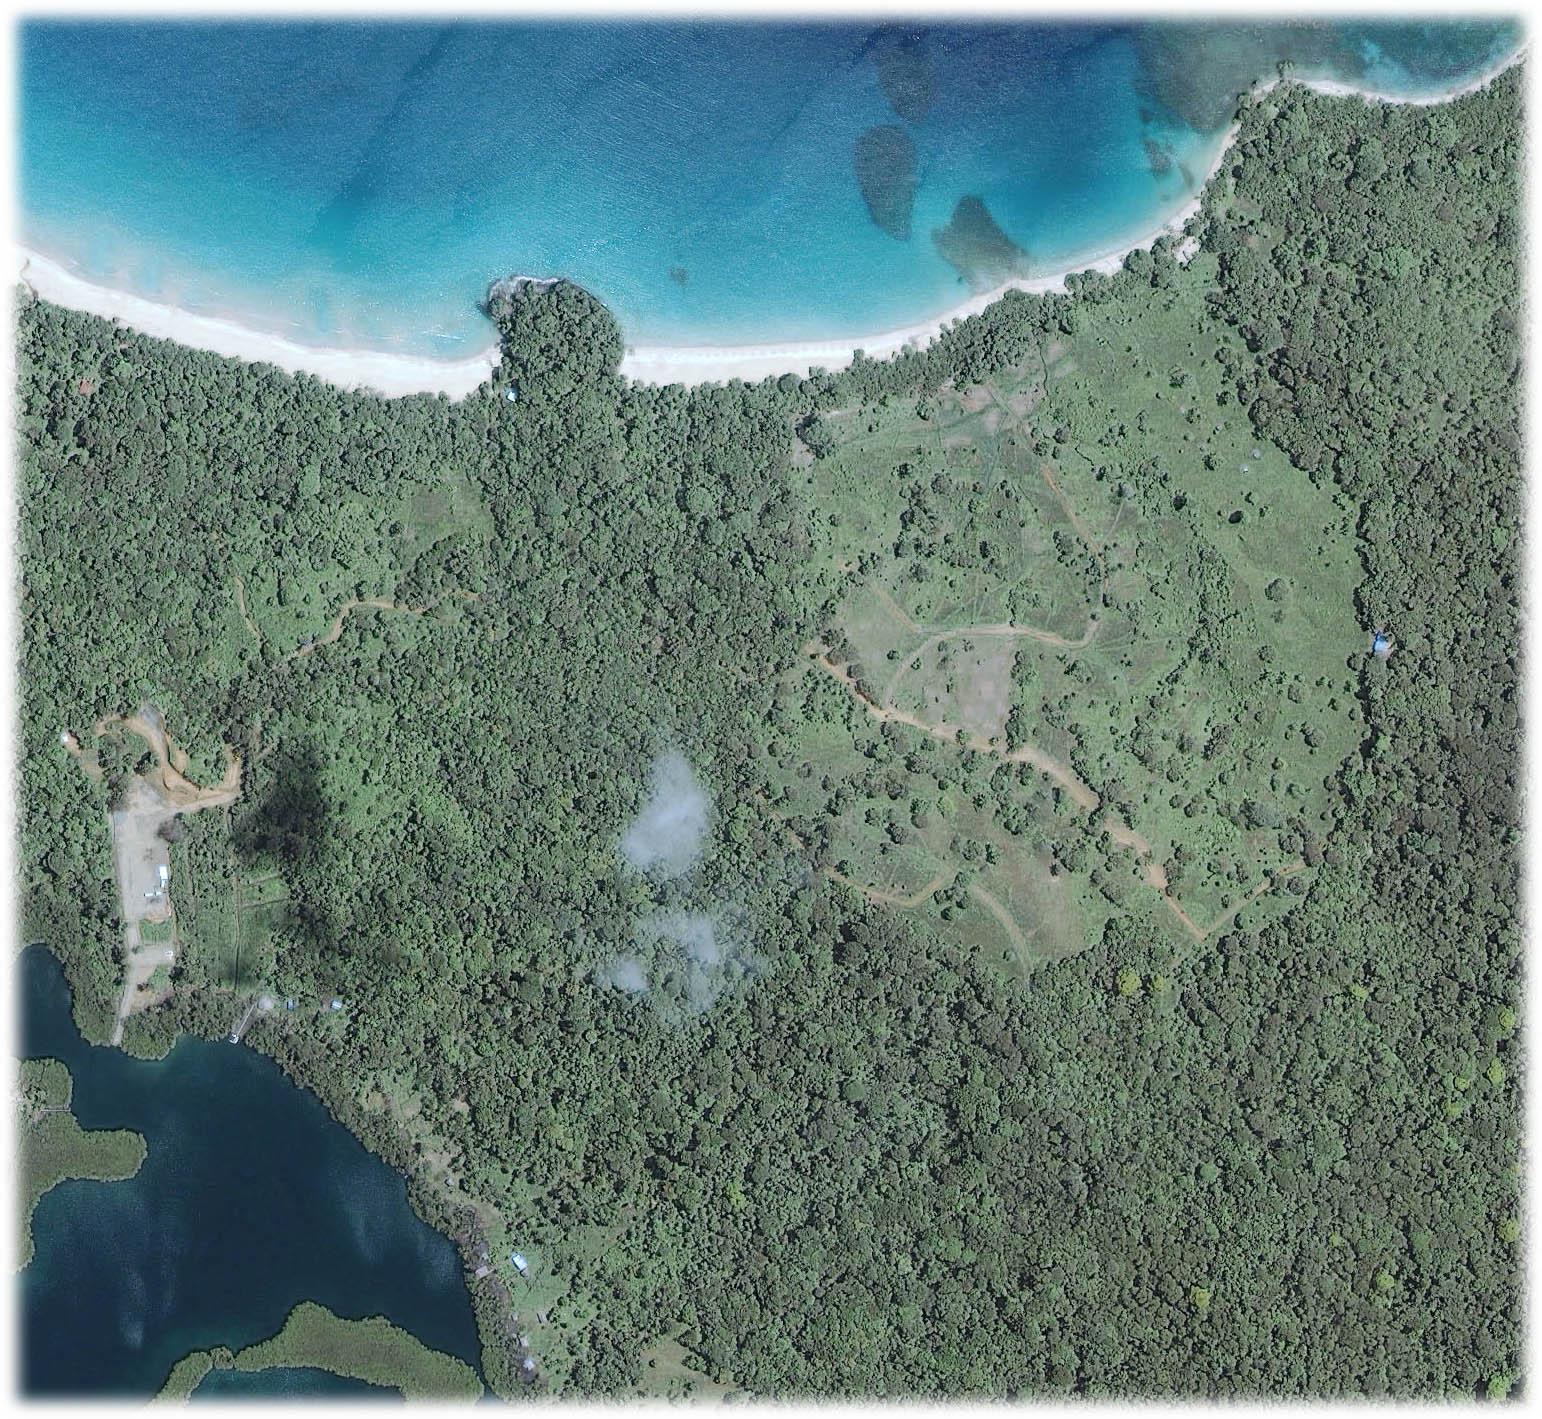 2003 deforessted Bastimentos grazing land.jpg